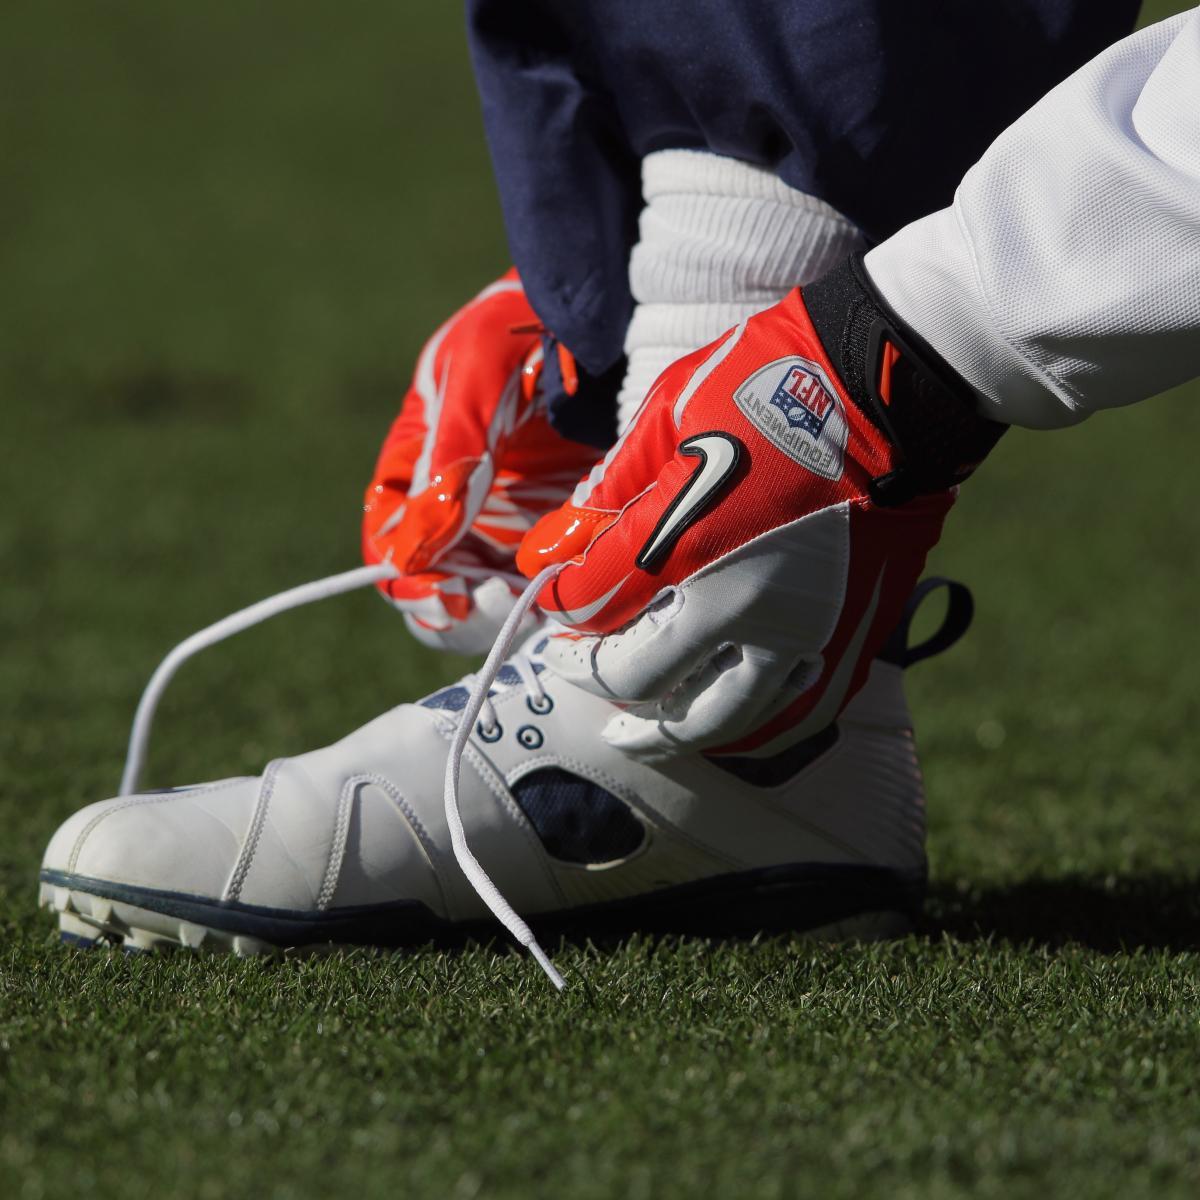 Denver Broncos: How The New-Look Broncos Can Tear Through